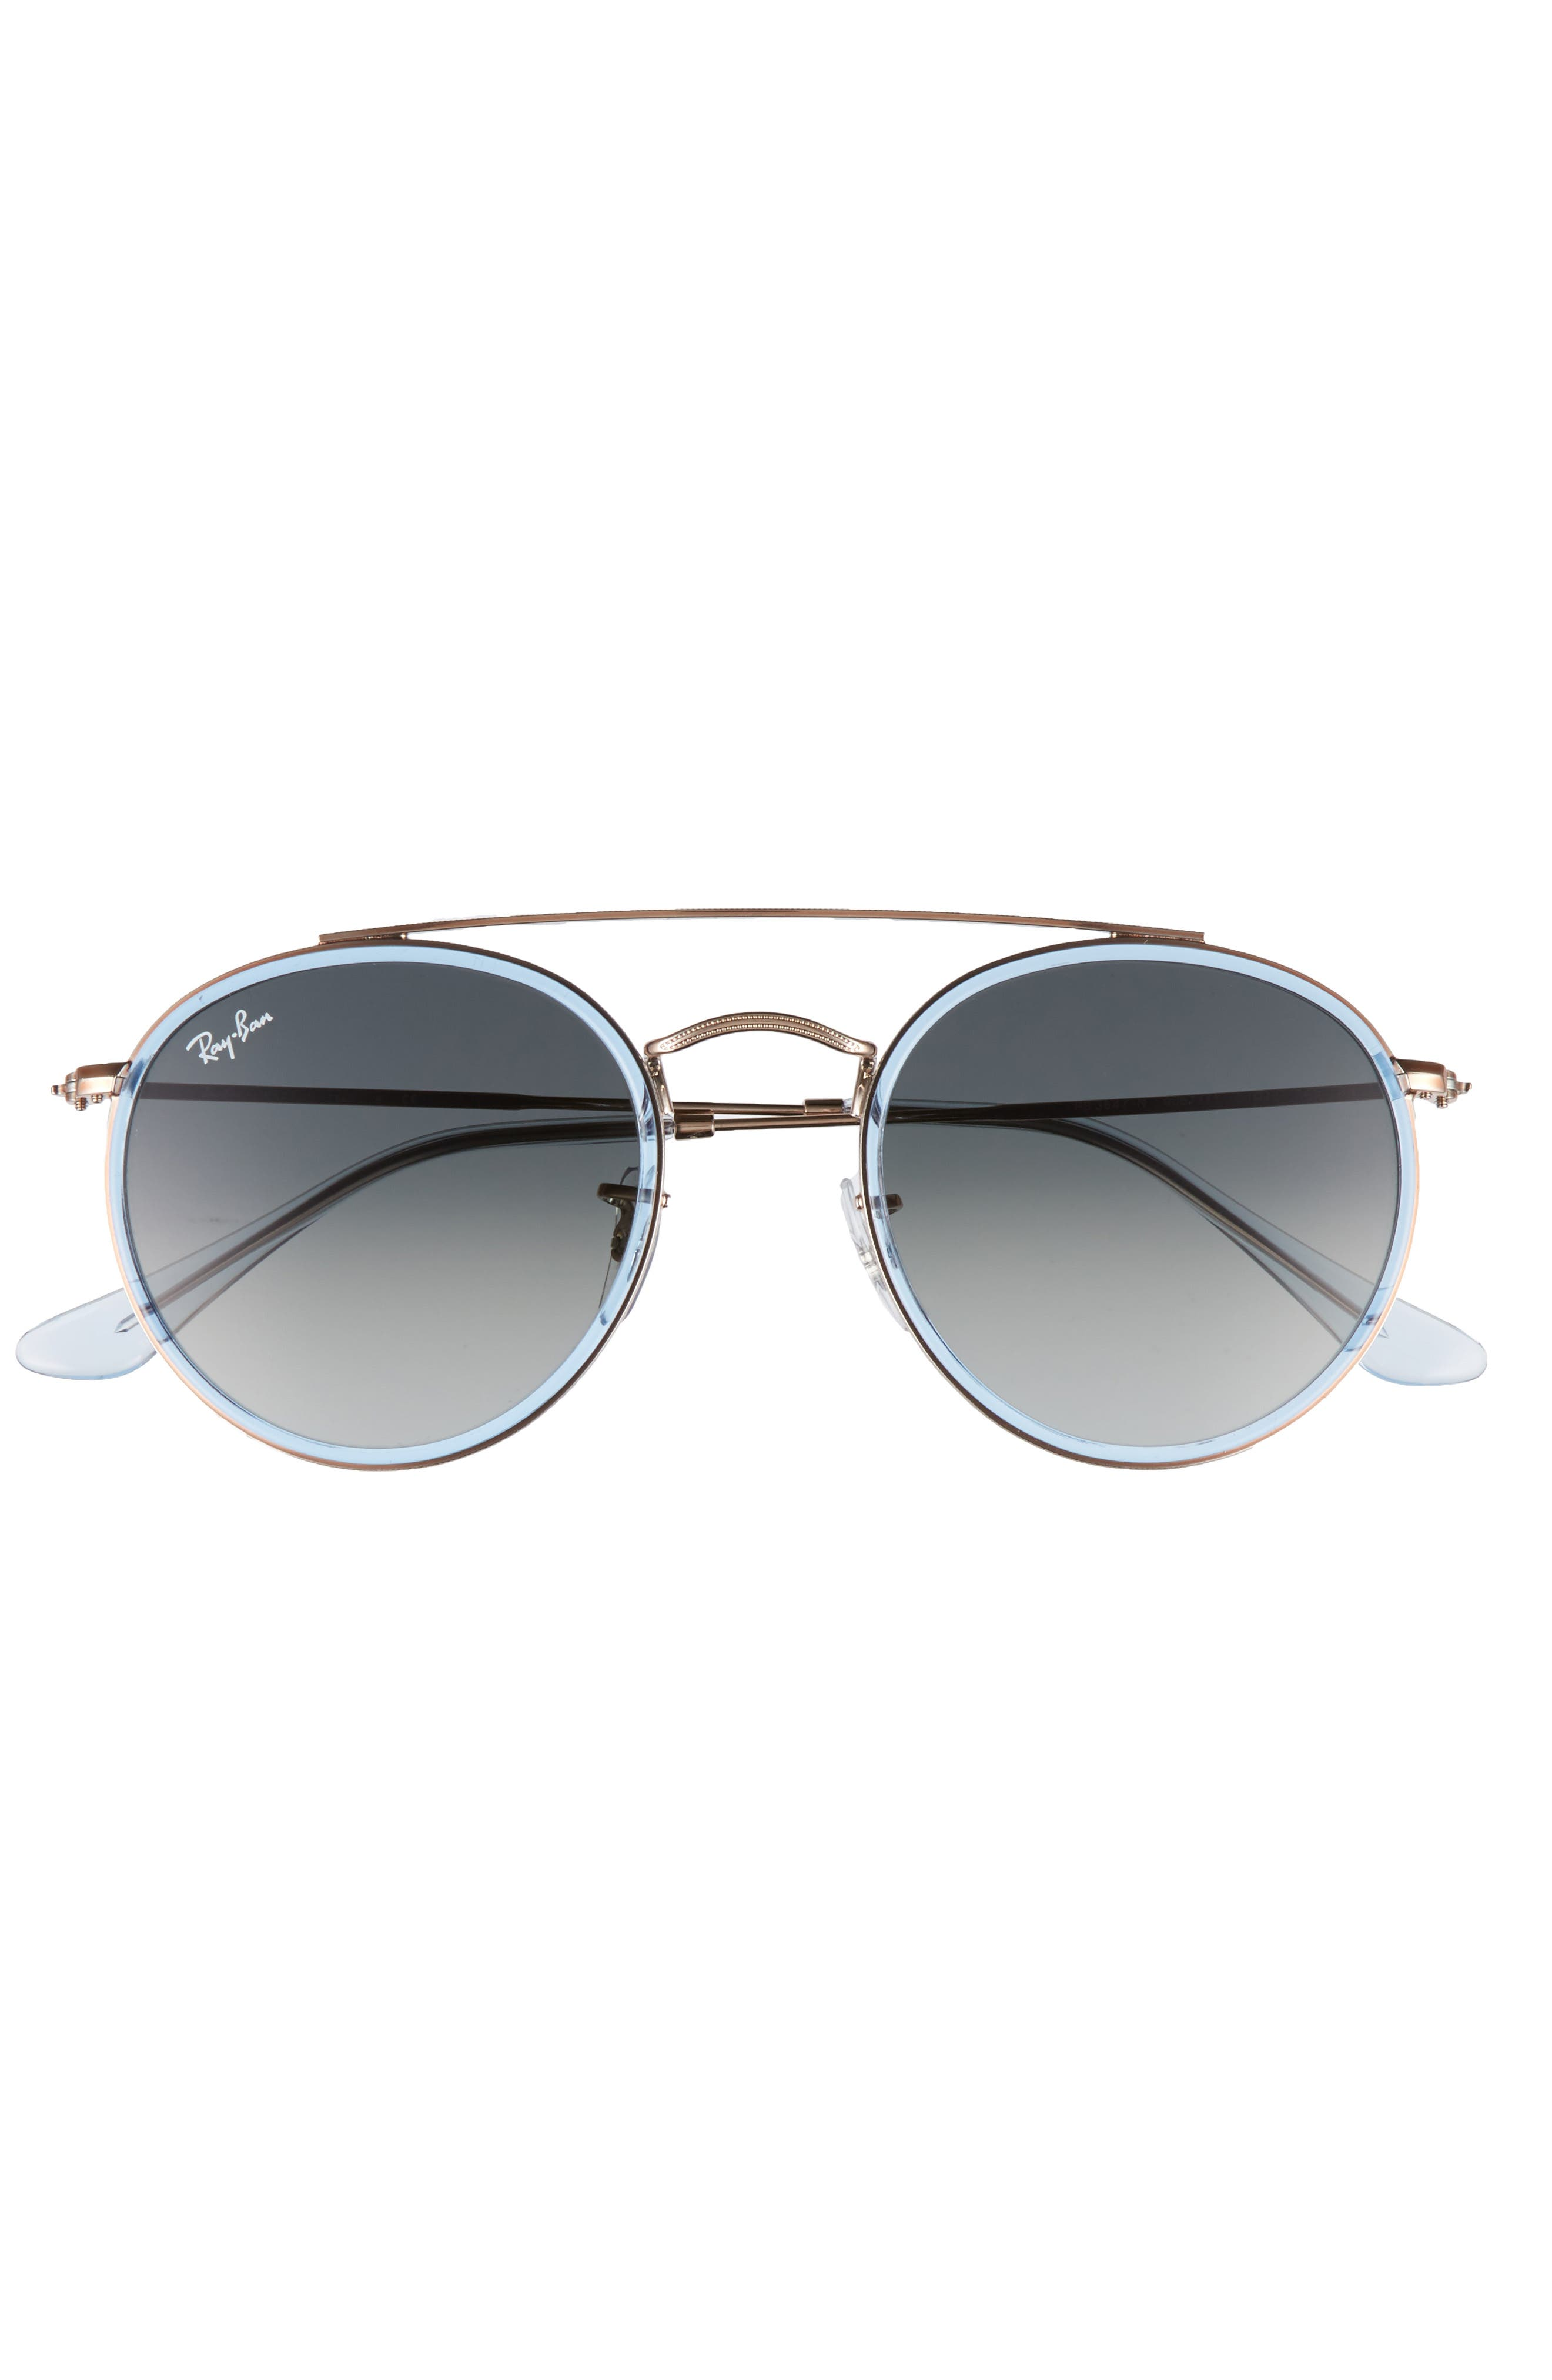 51mm Aviator Gradient Lens Sunglasses,                             Alternate thumbnail 10, color,